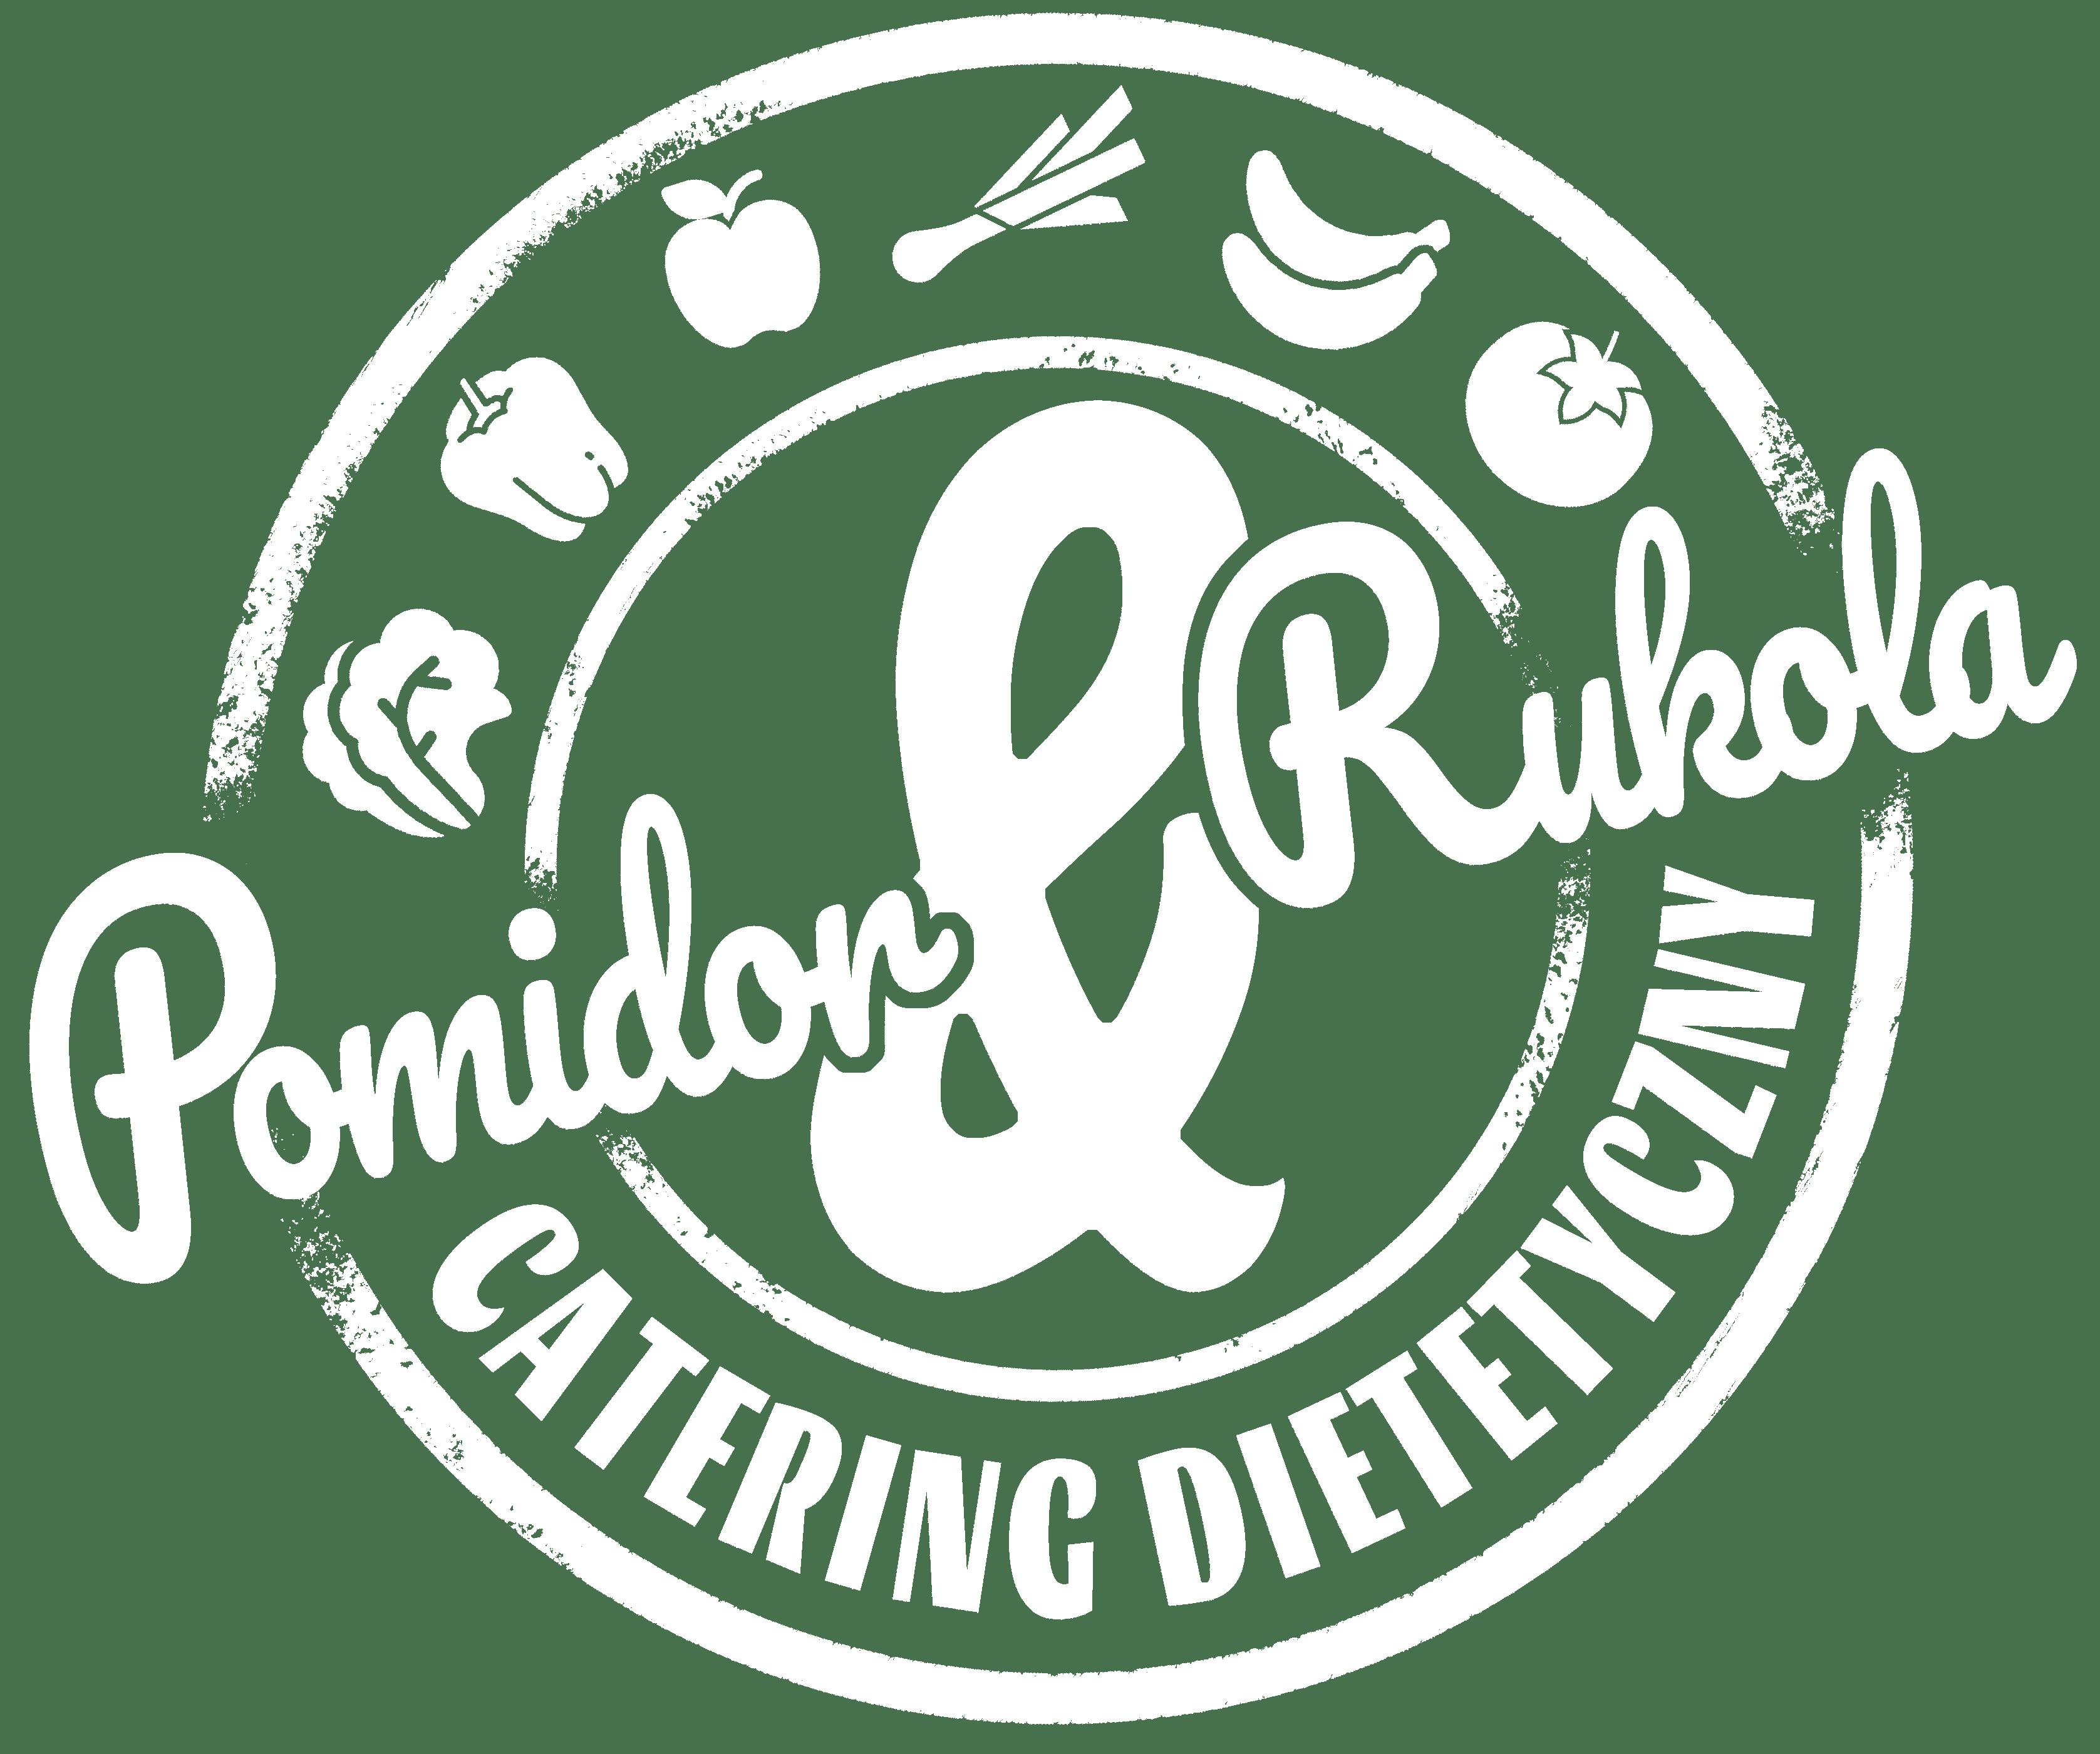 Pomidor Rukola Catering Dietetyczny